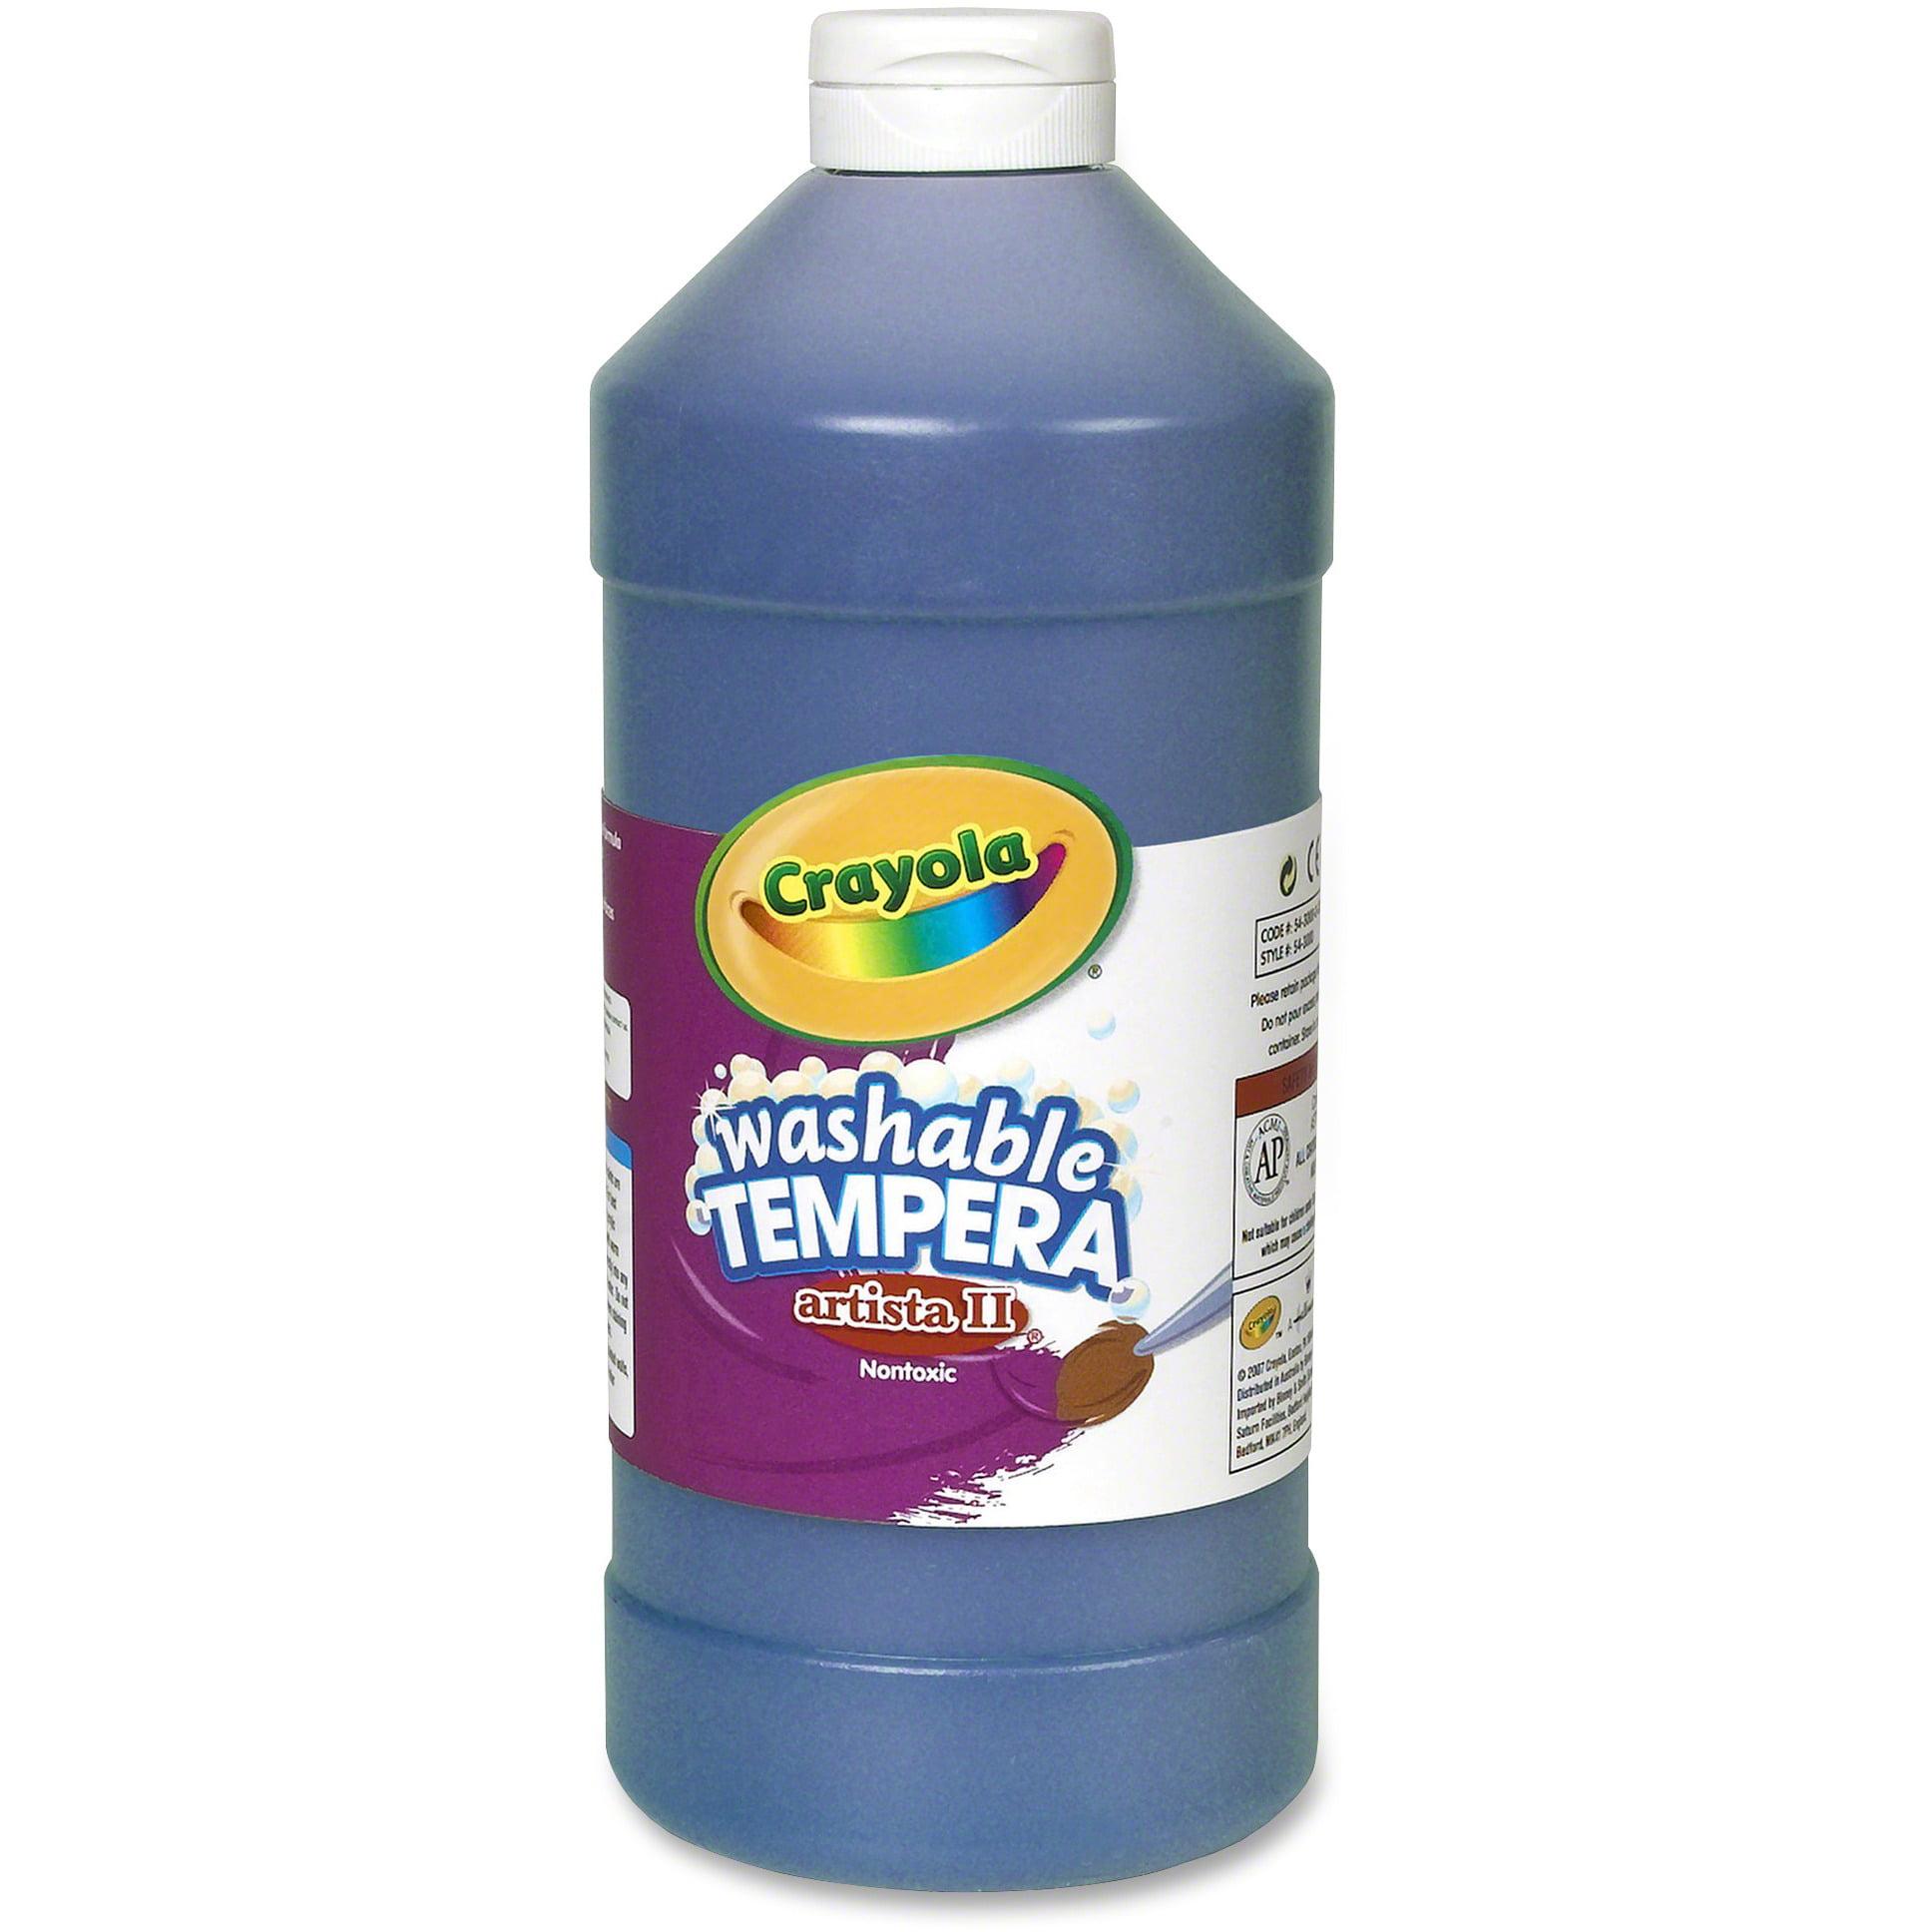 Crayola Artista Ii Washable Tempera Paint, 32 Oz, Blue